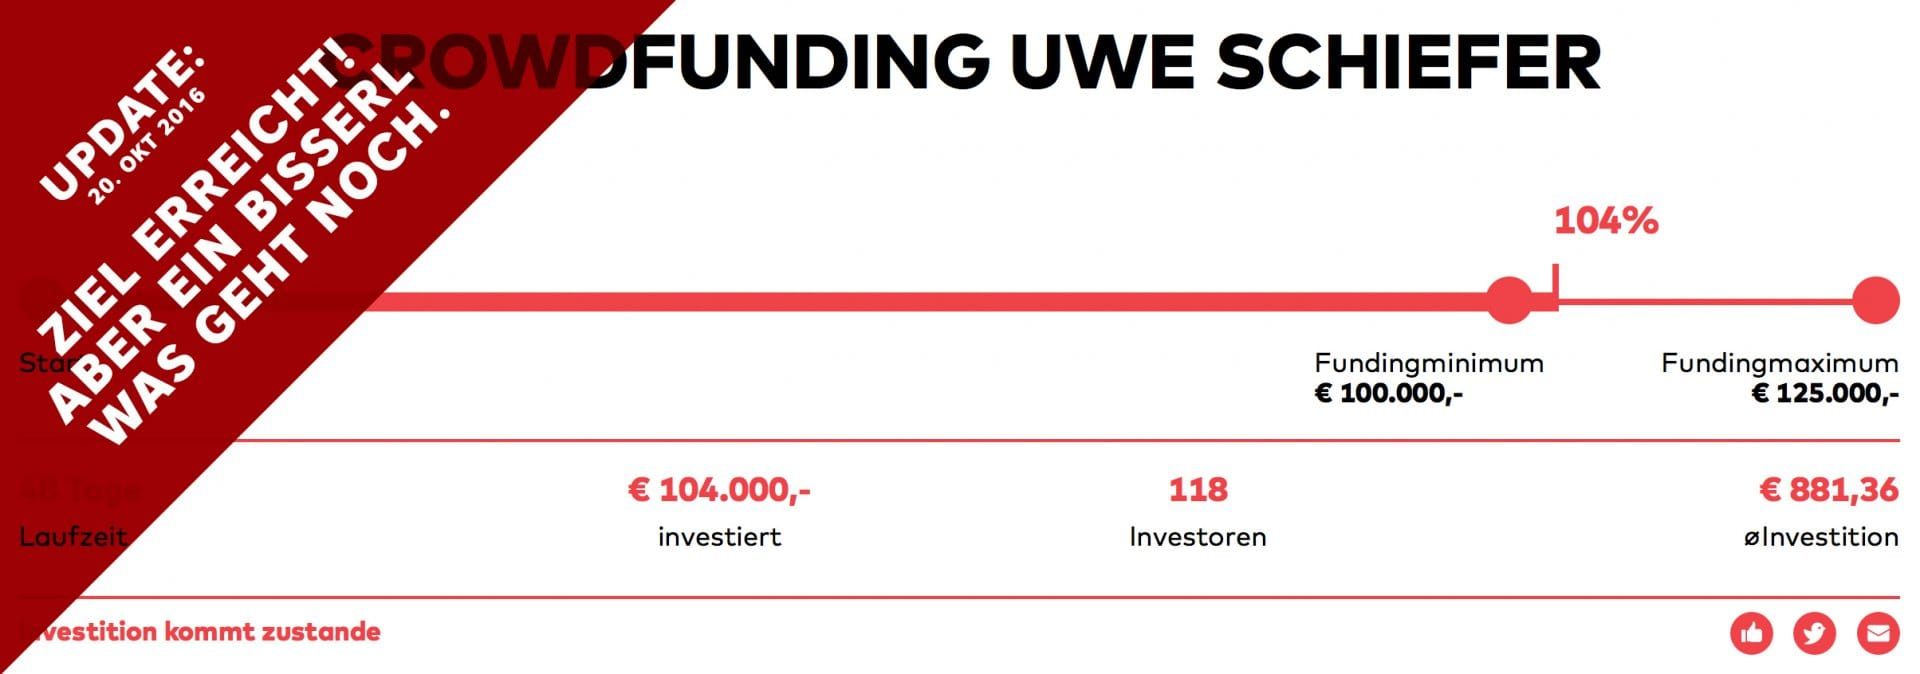 Uwe-crowdfunding